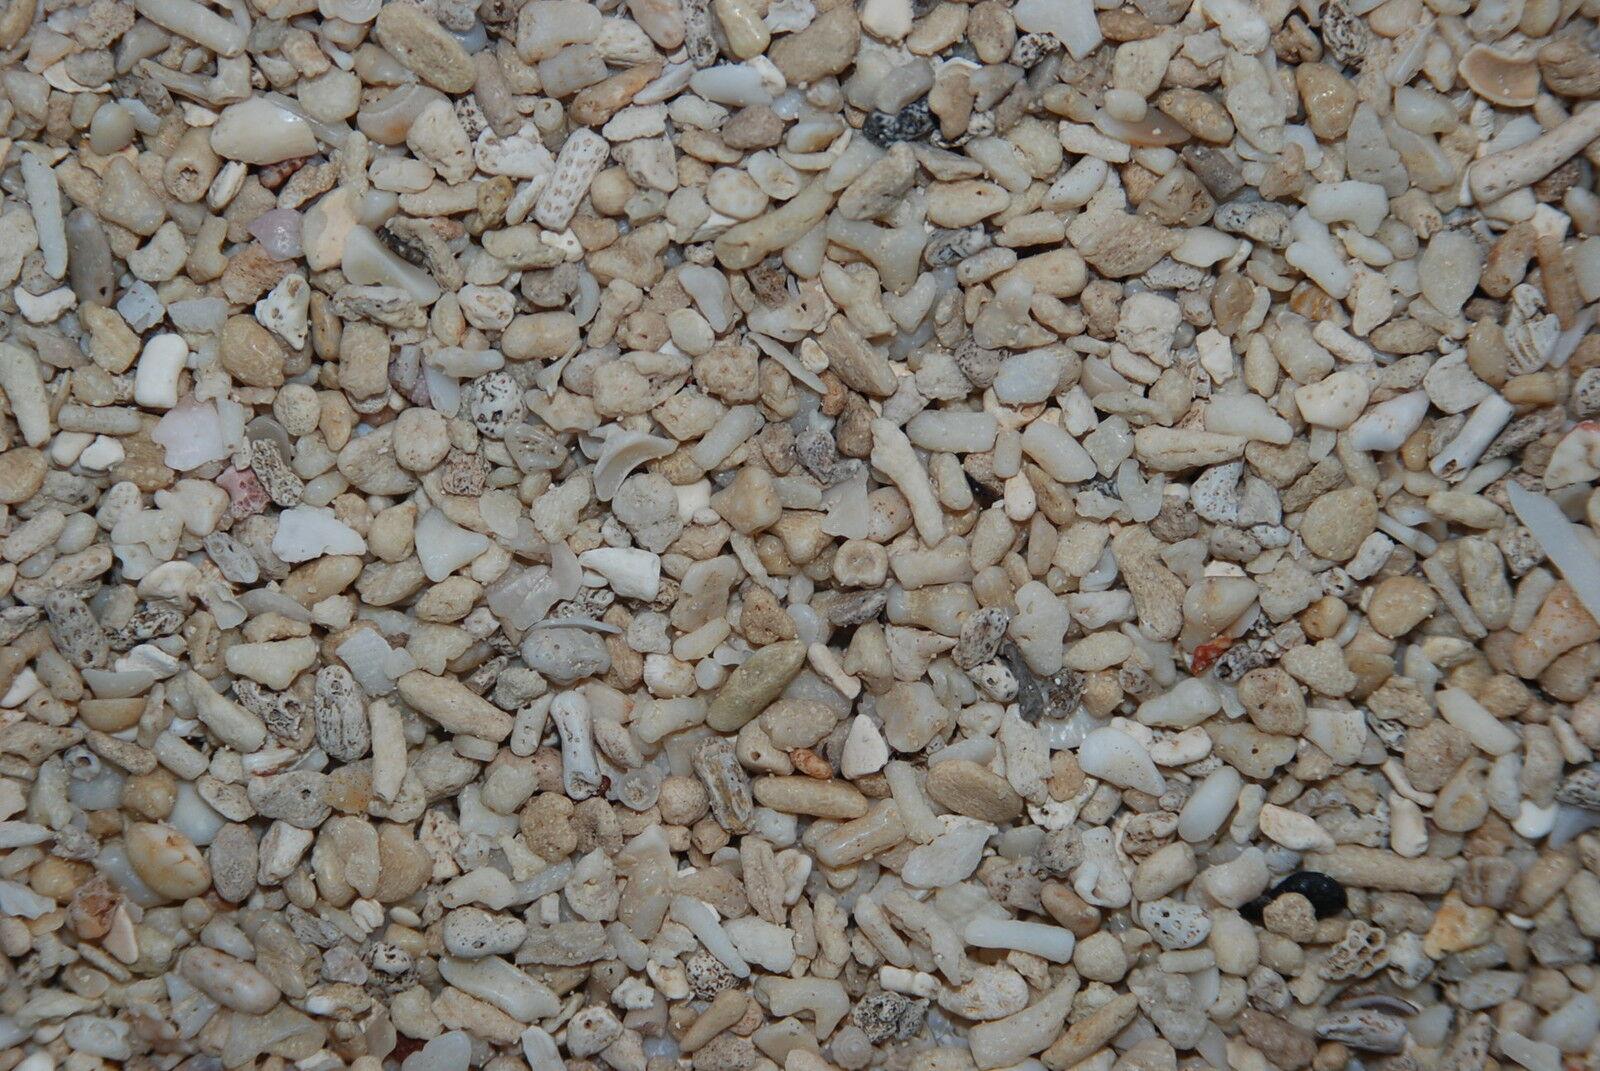 Aquarium Cichlid Coral Sand  25 Kilo Bag Sand Größe Approx 10 mm for Aquariums